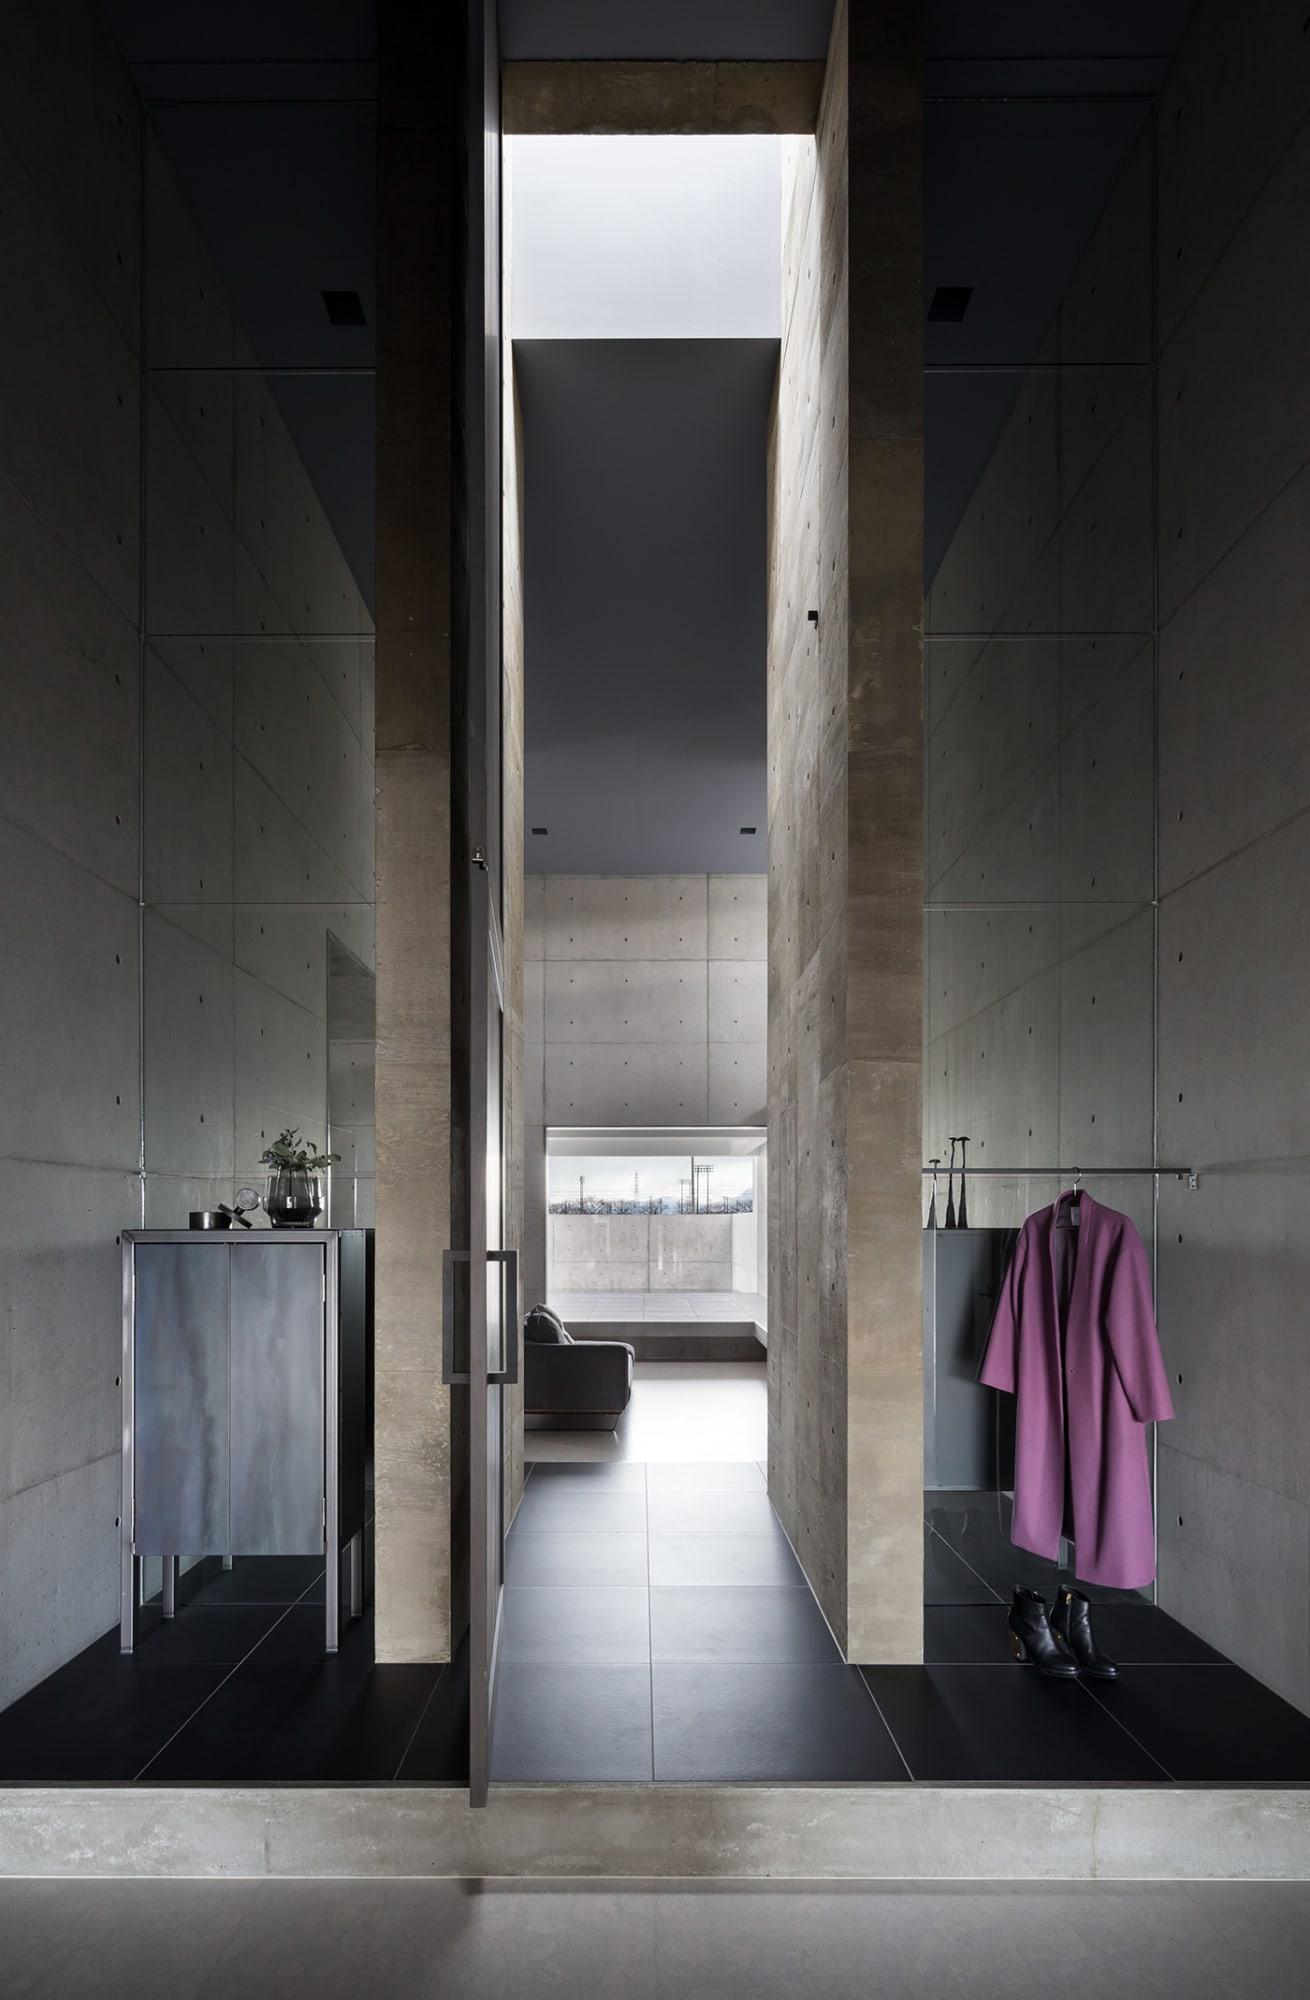 FORM / Kouichi Kimura Architects, Yoshihiro Asada, Norihito Yamauchi